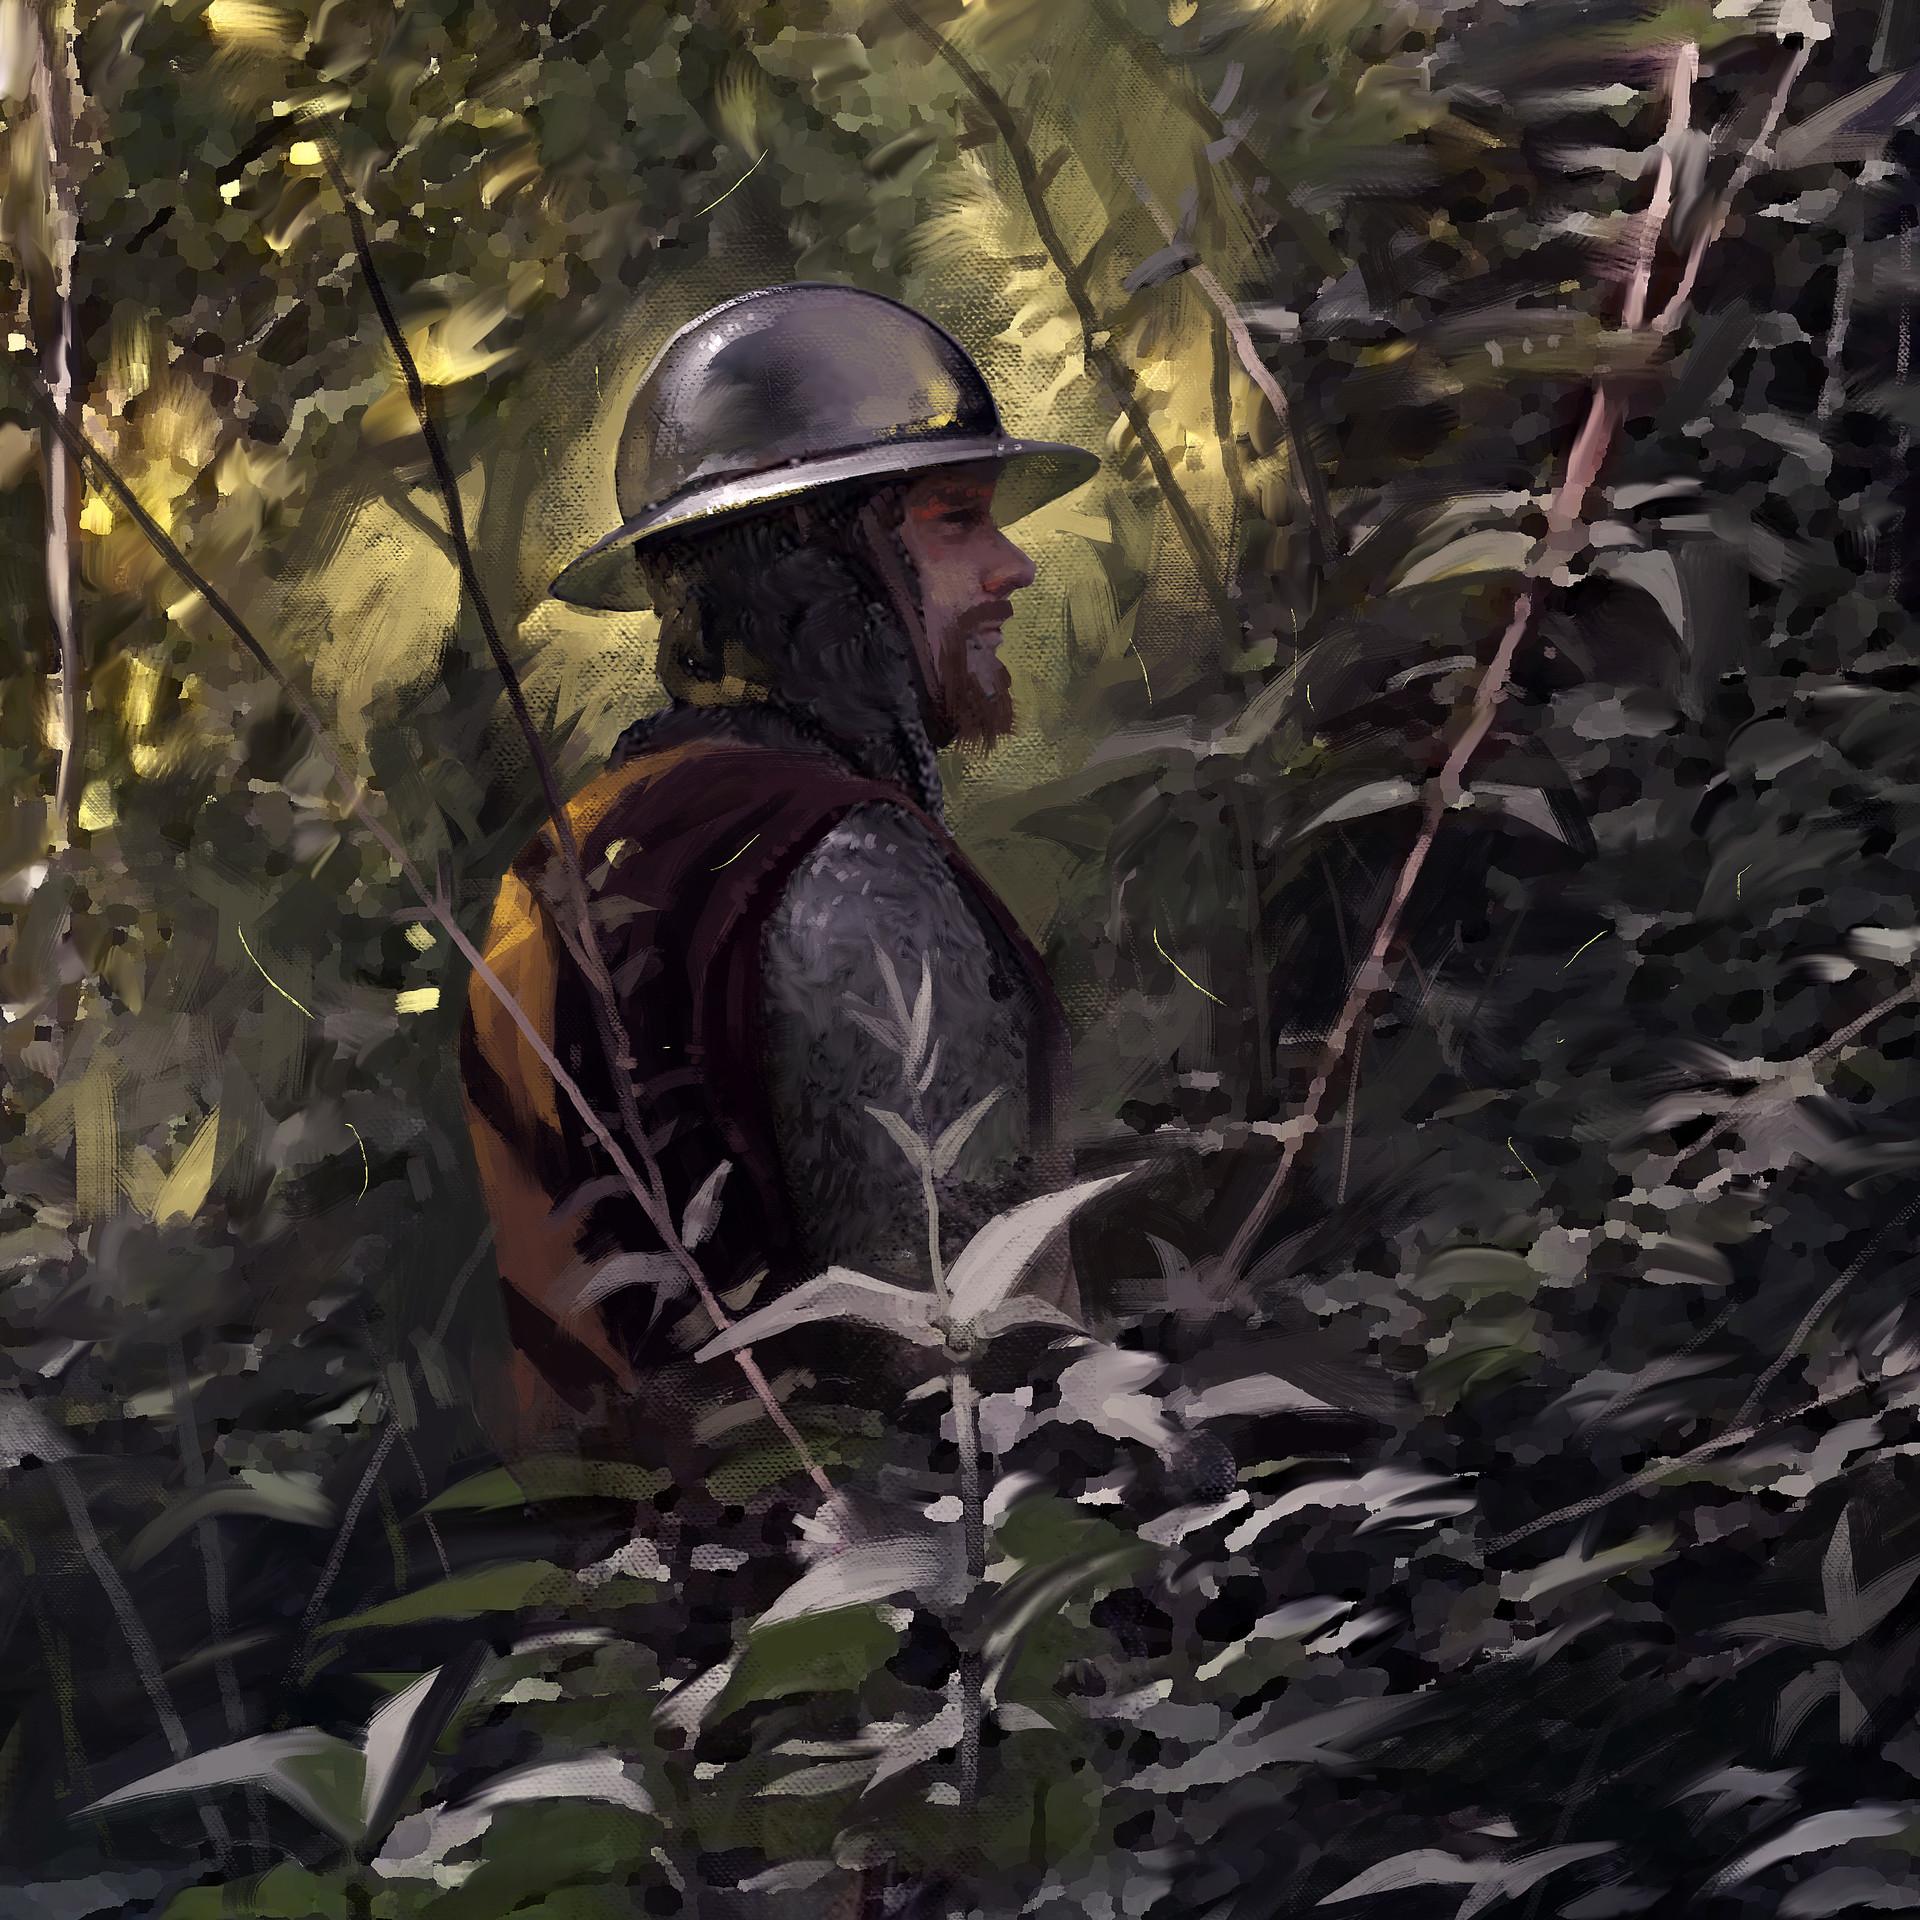 Dominik mayer forestpainting 09 detail02